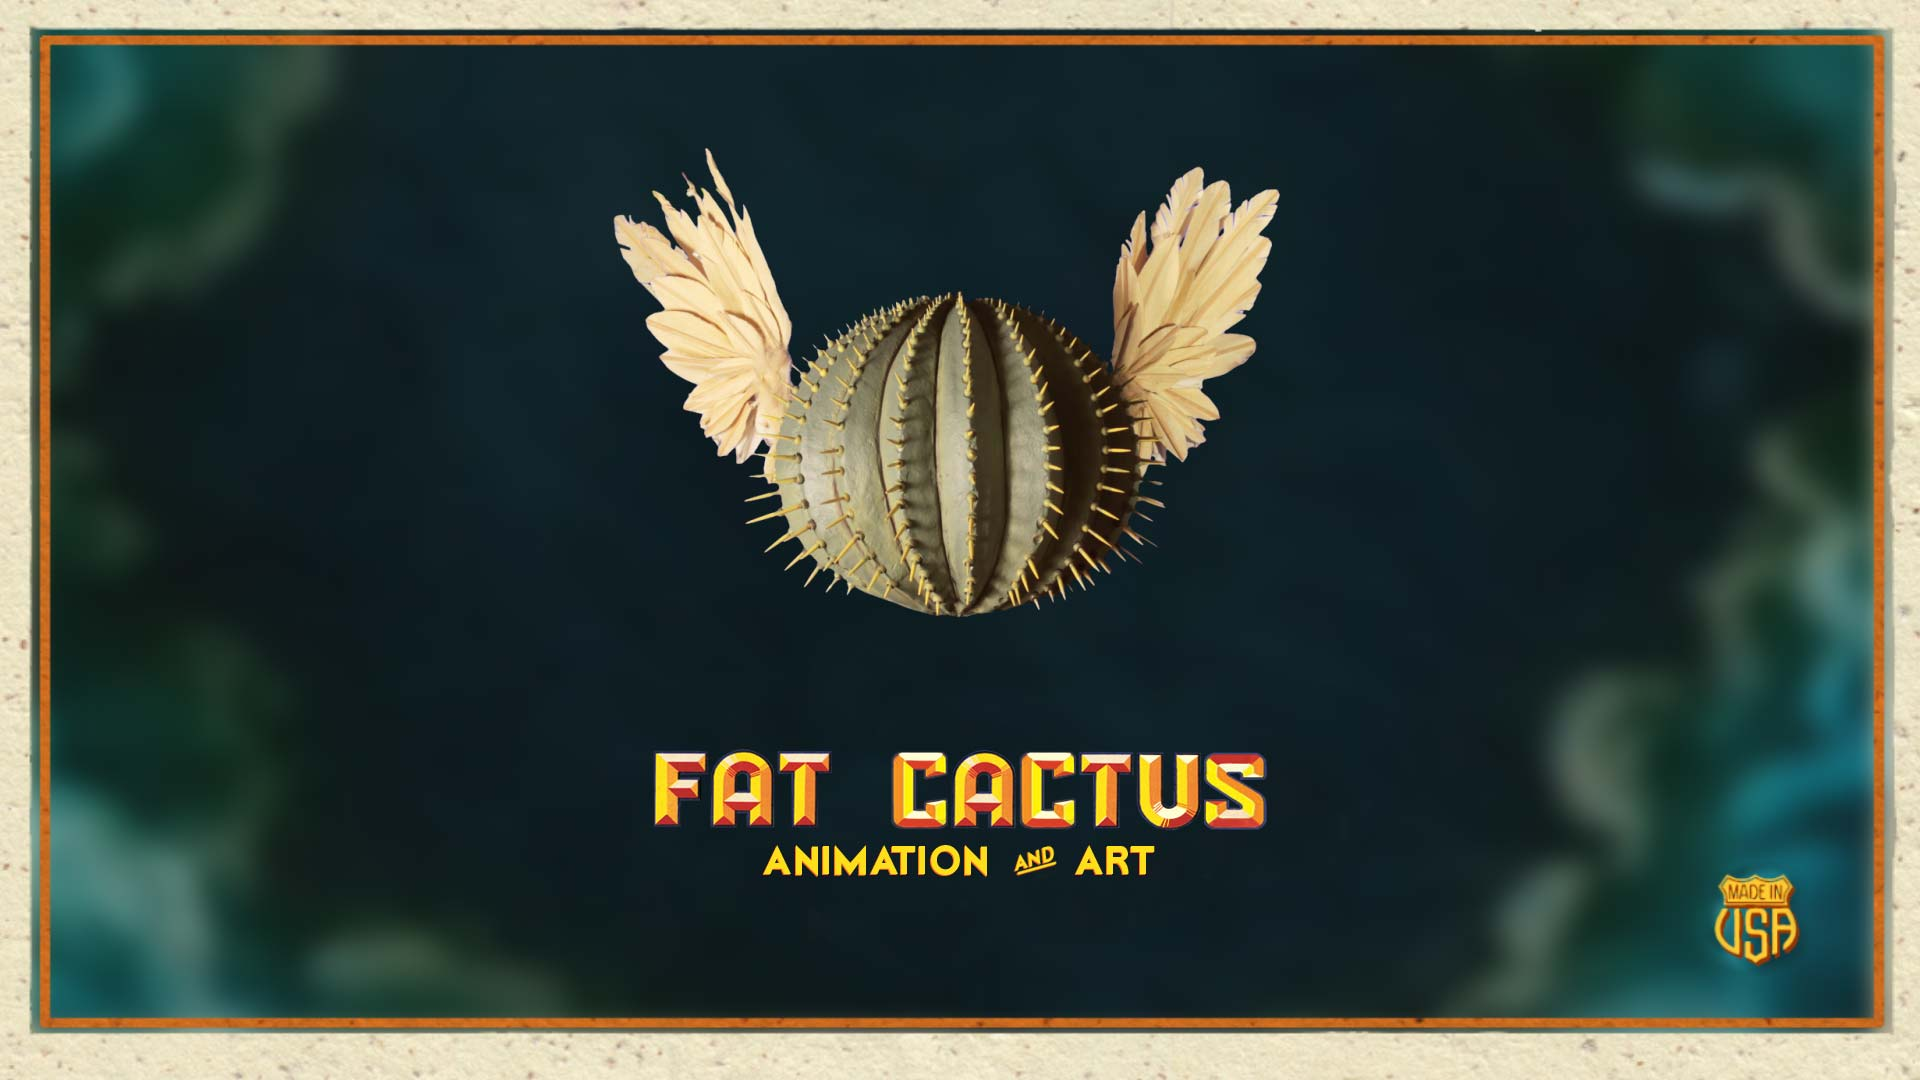 Fatcactus-home